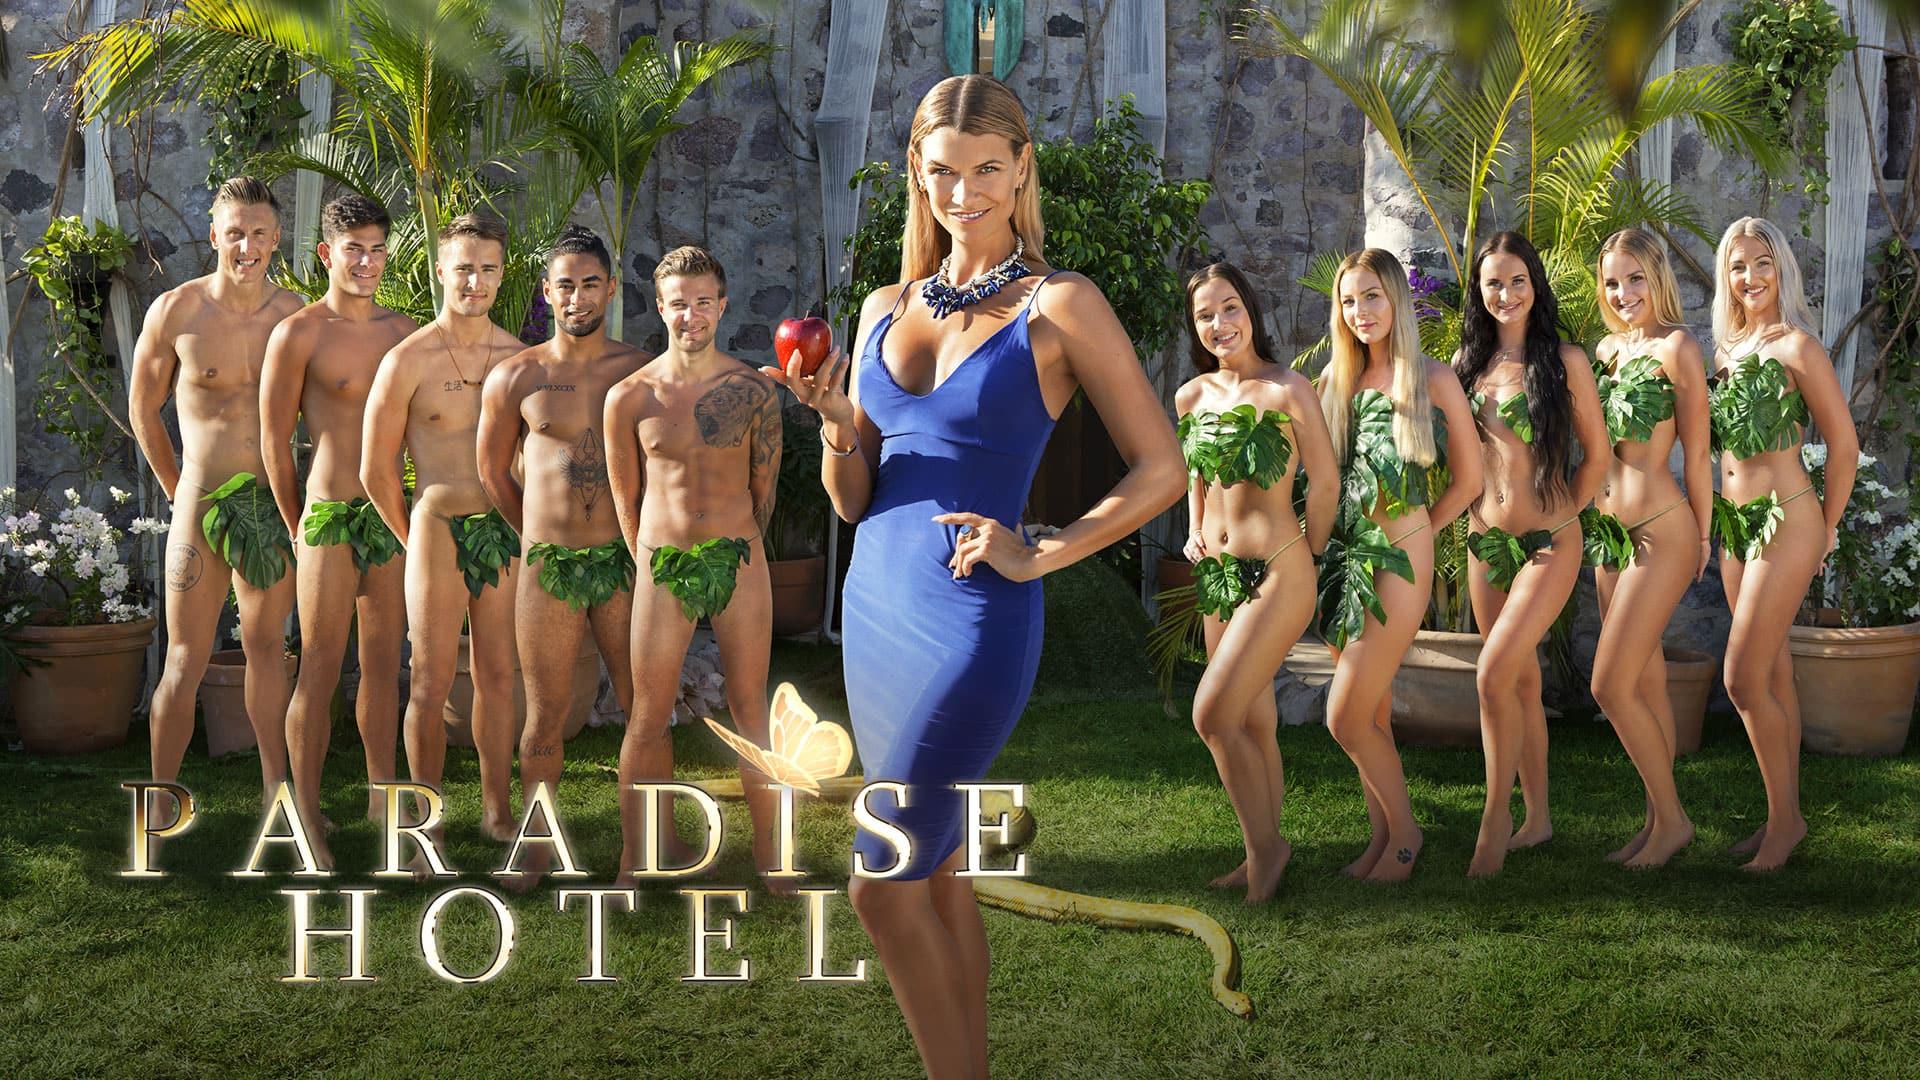 paradise hotel deltakere 2018 norwegian sex tapes